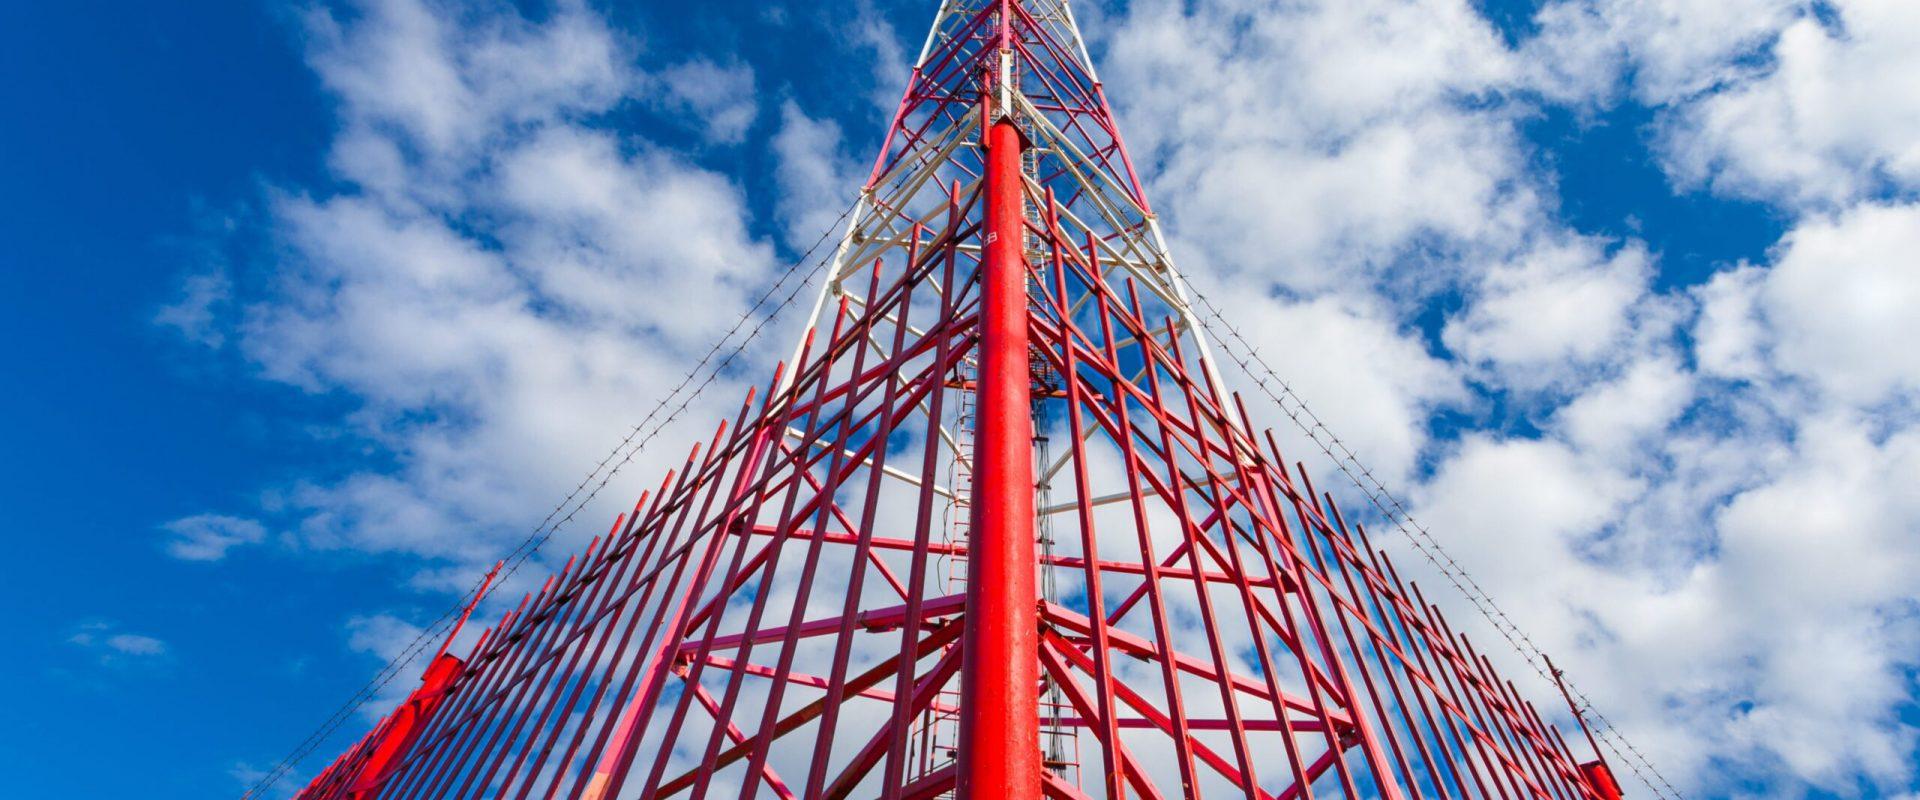 Industry_Telecom_Image